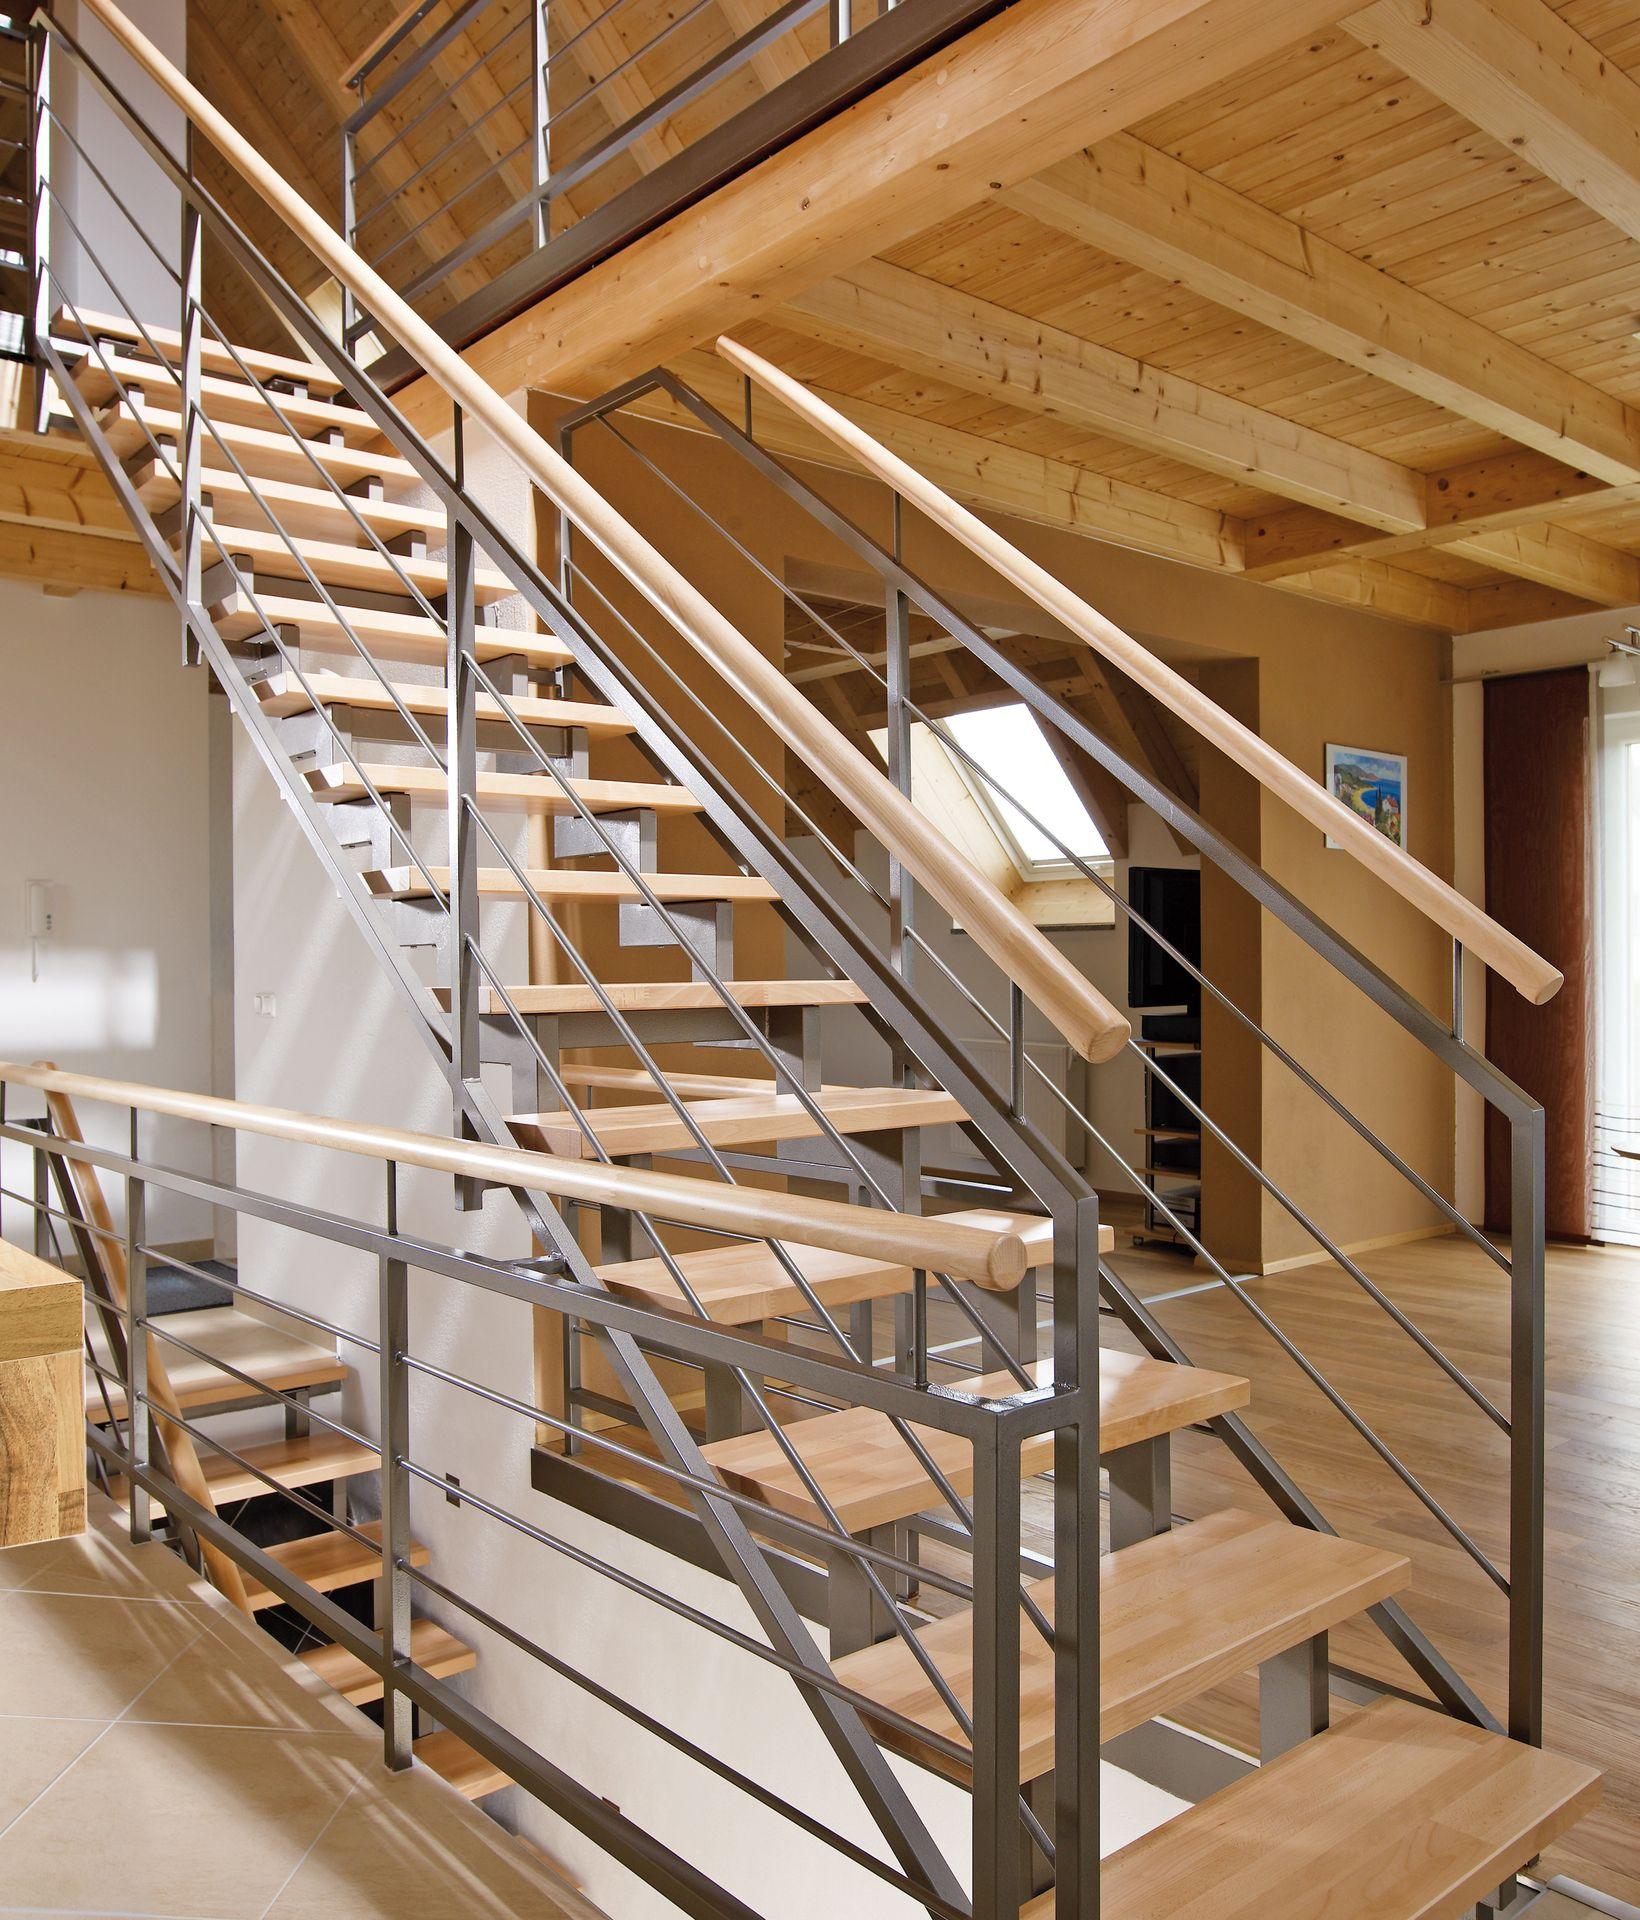 fuchs treppe 28 images fuchs treppe treppen karlsruhe. Black Bedroom Furniture Sets. Home Design Ideas